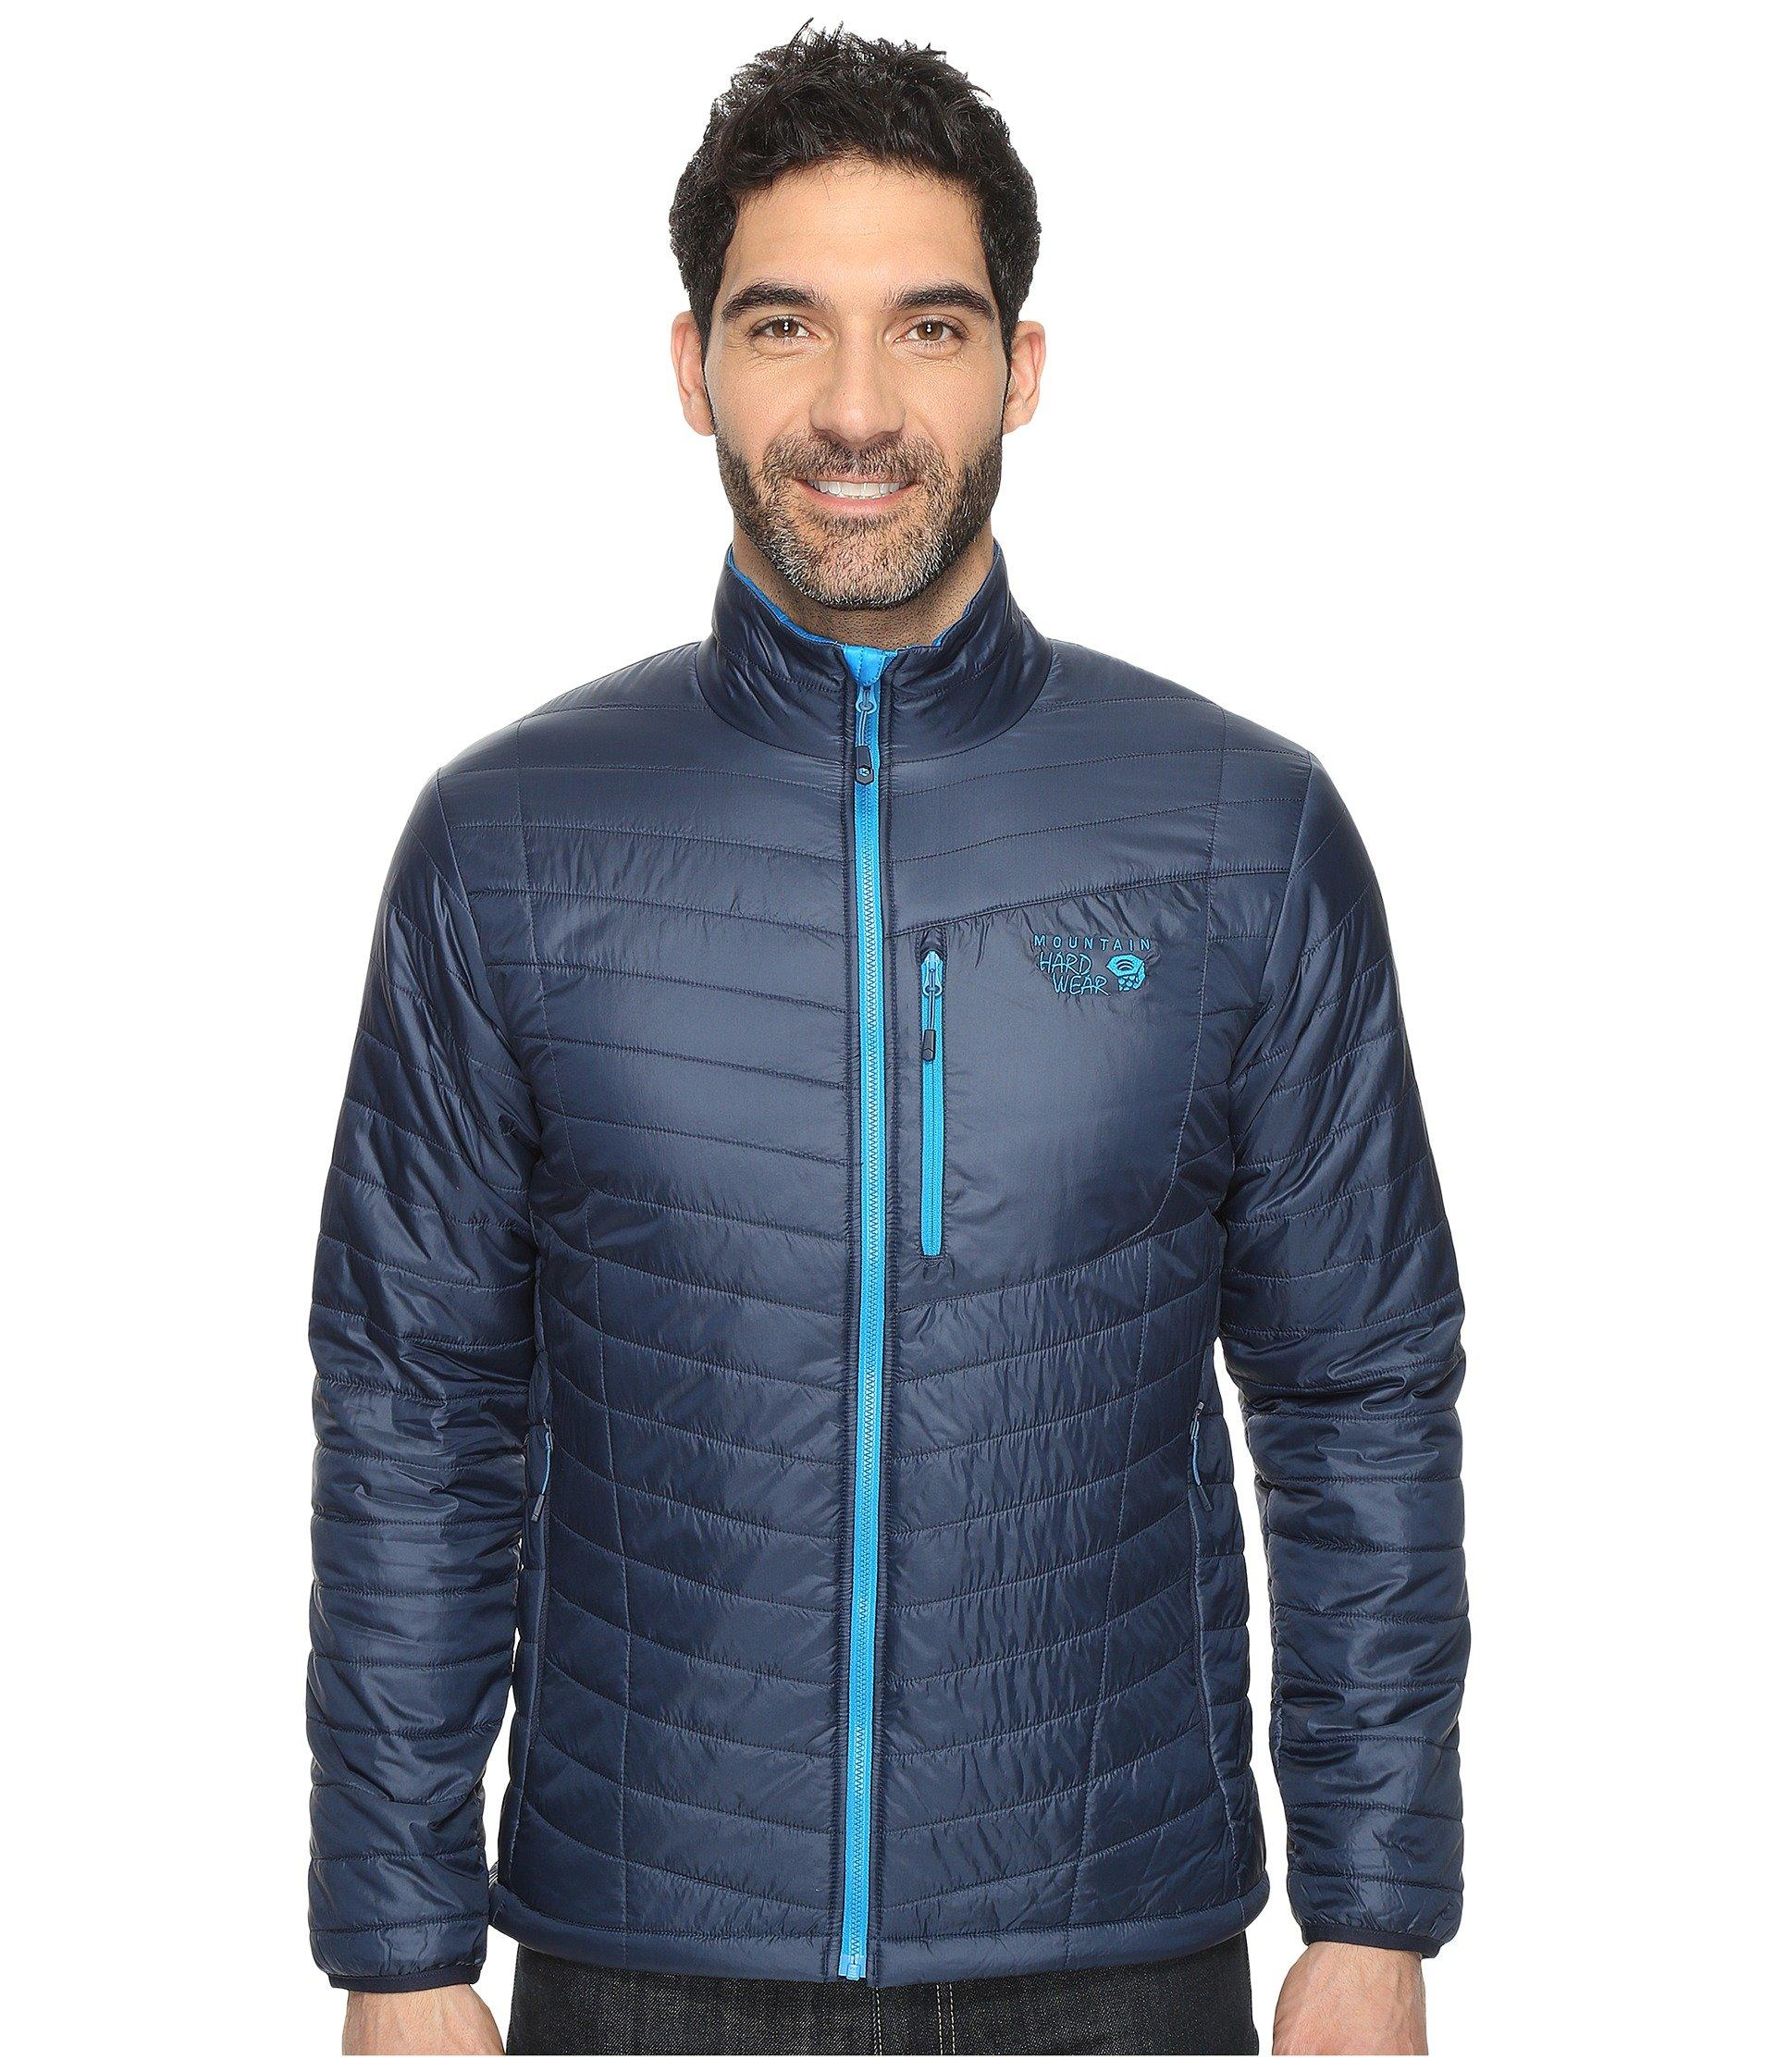 Mountain Hardwear Thermostatic™ Jacket In Hardwear Navy